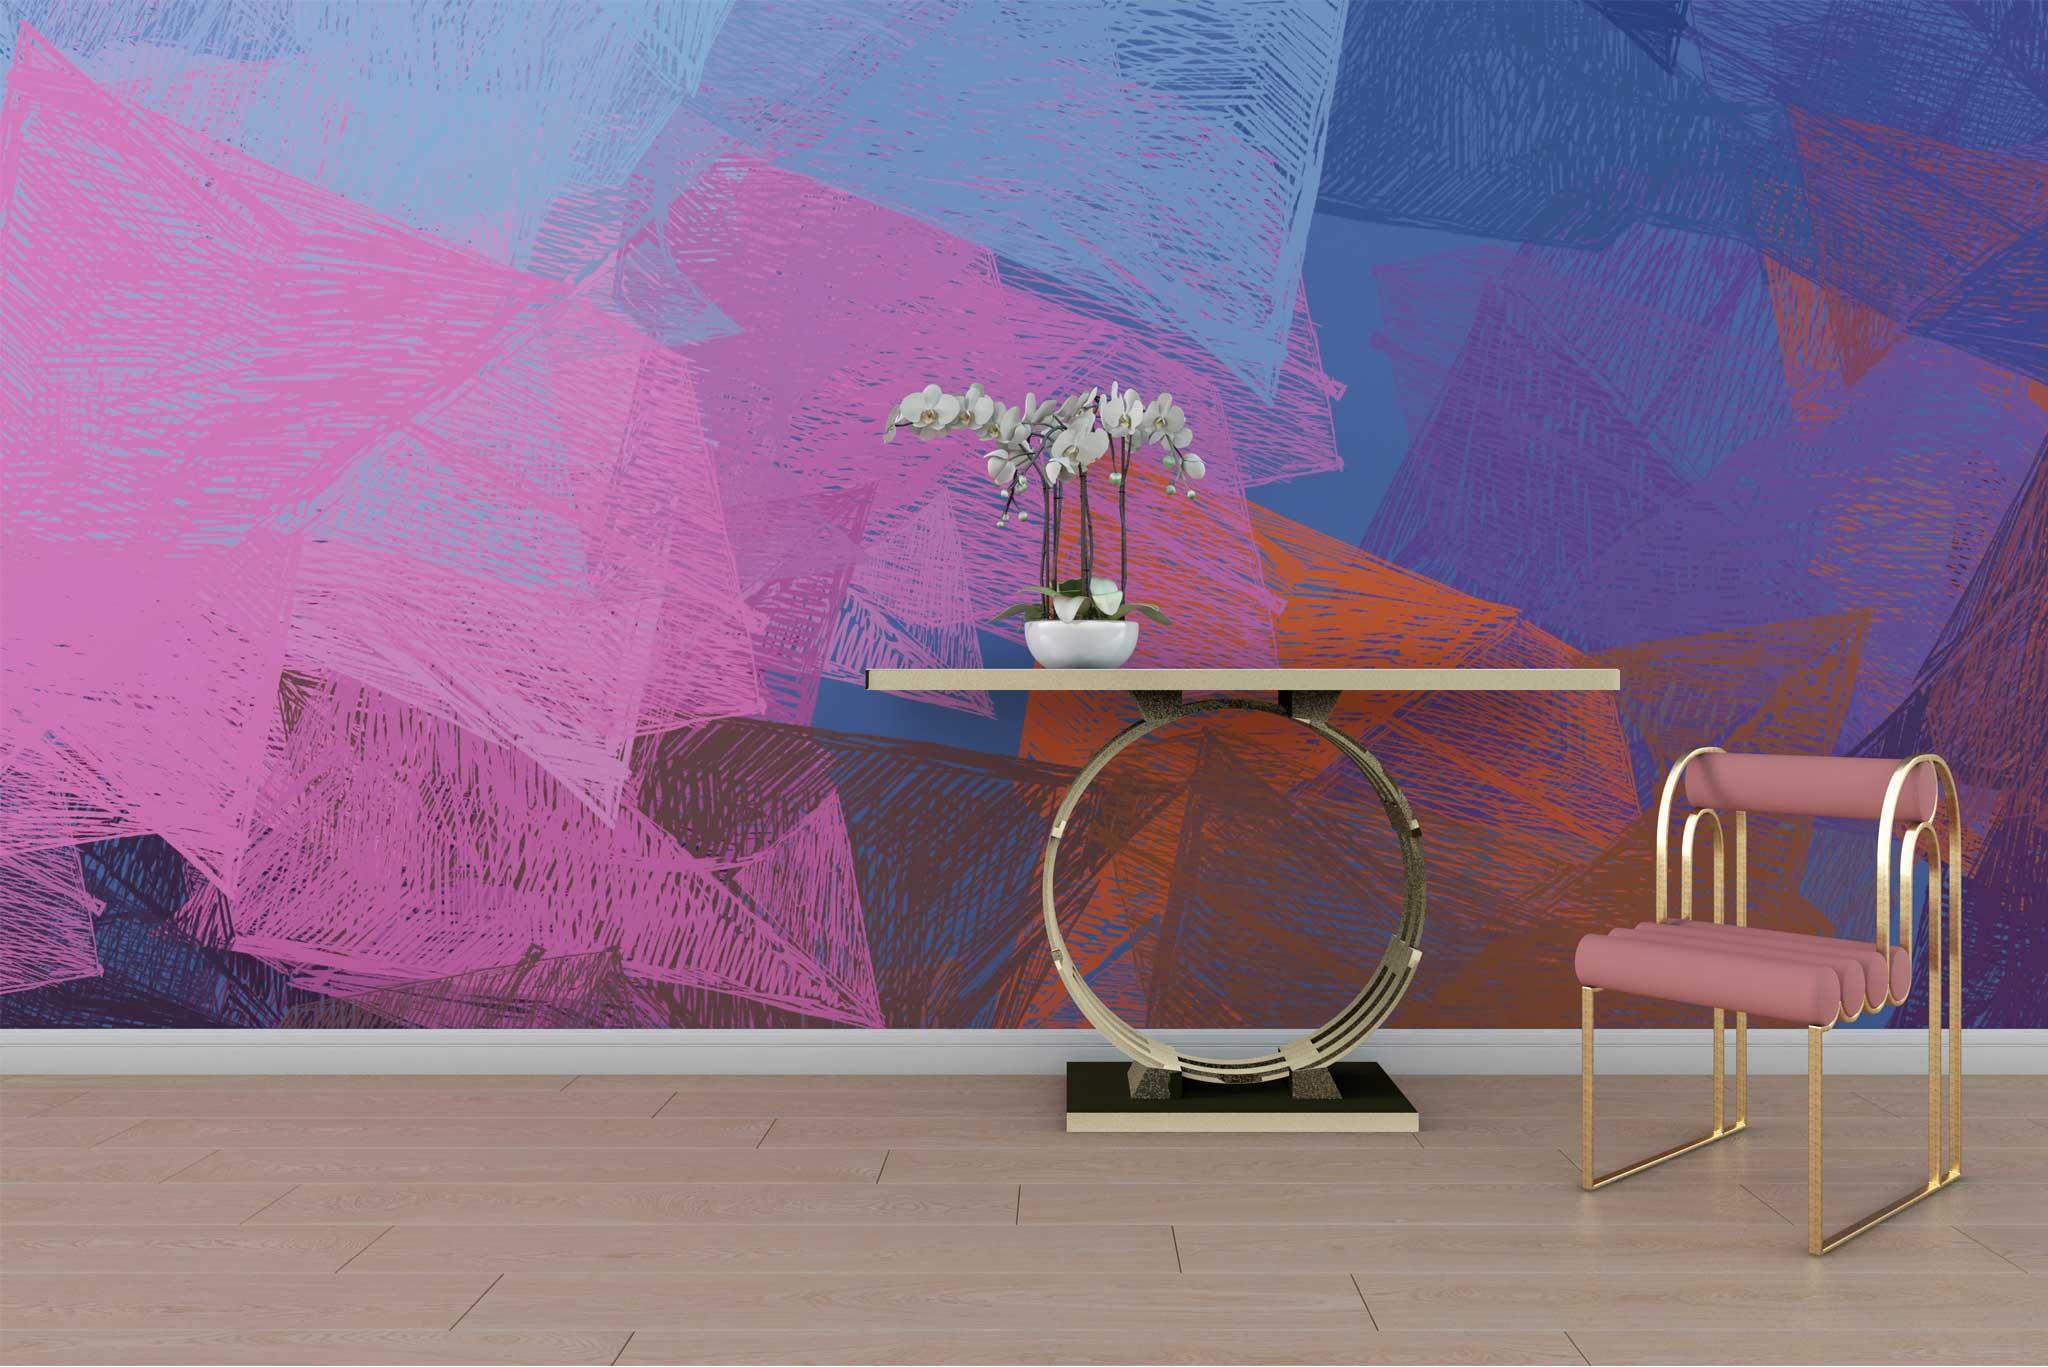 tapet-fototapet-design-customizabil-comanda-personalizat-decor-mural-bucuresti-daring-prints-motiv-desen-geometric-abstract-contemporan-culori-roz-mov-albastru